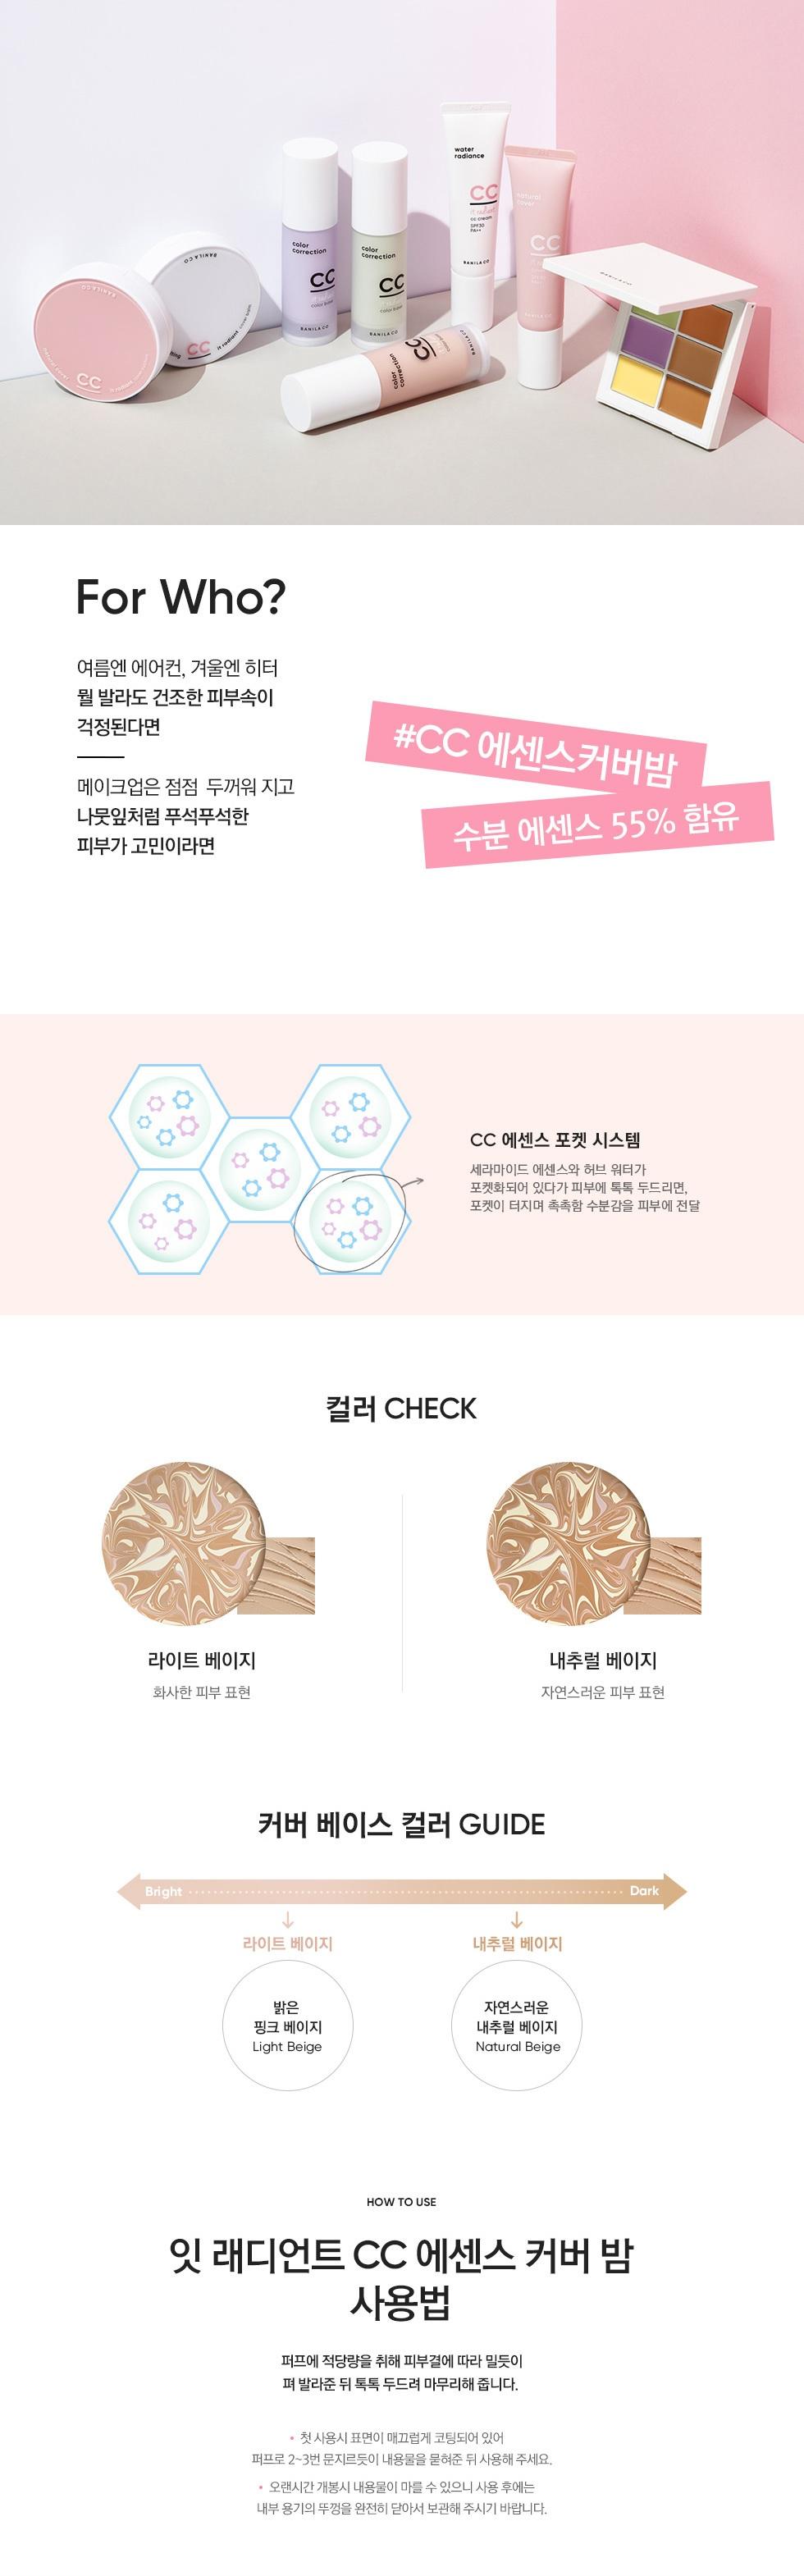 Banila Co It Radiant CC Essence Cover Balm 15g [2 type] korean comstic skincare product online shop malaysia India china2